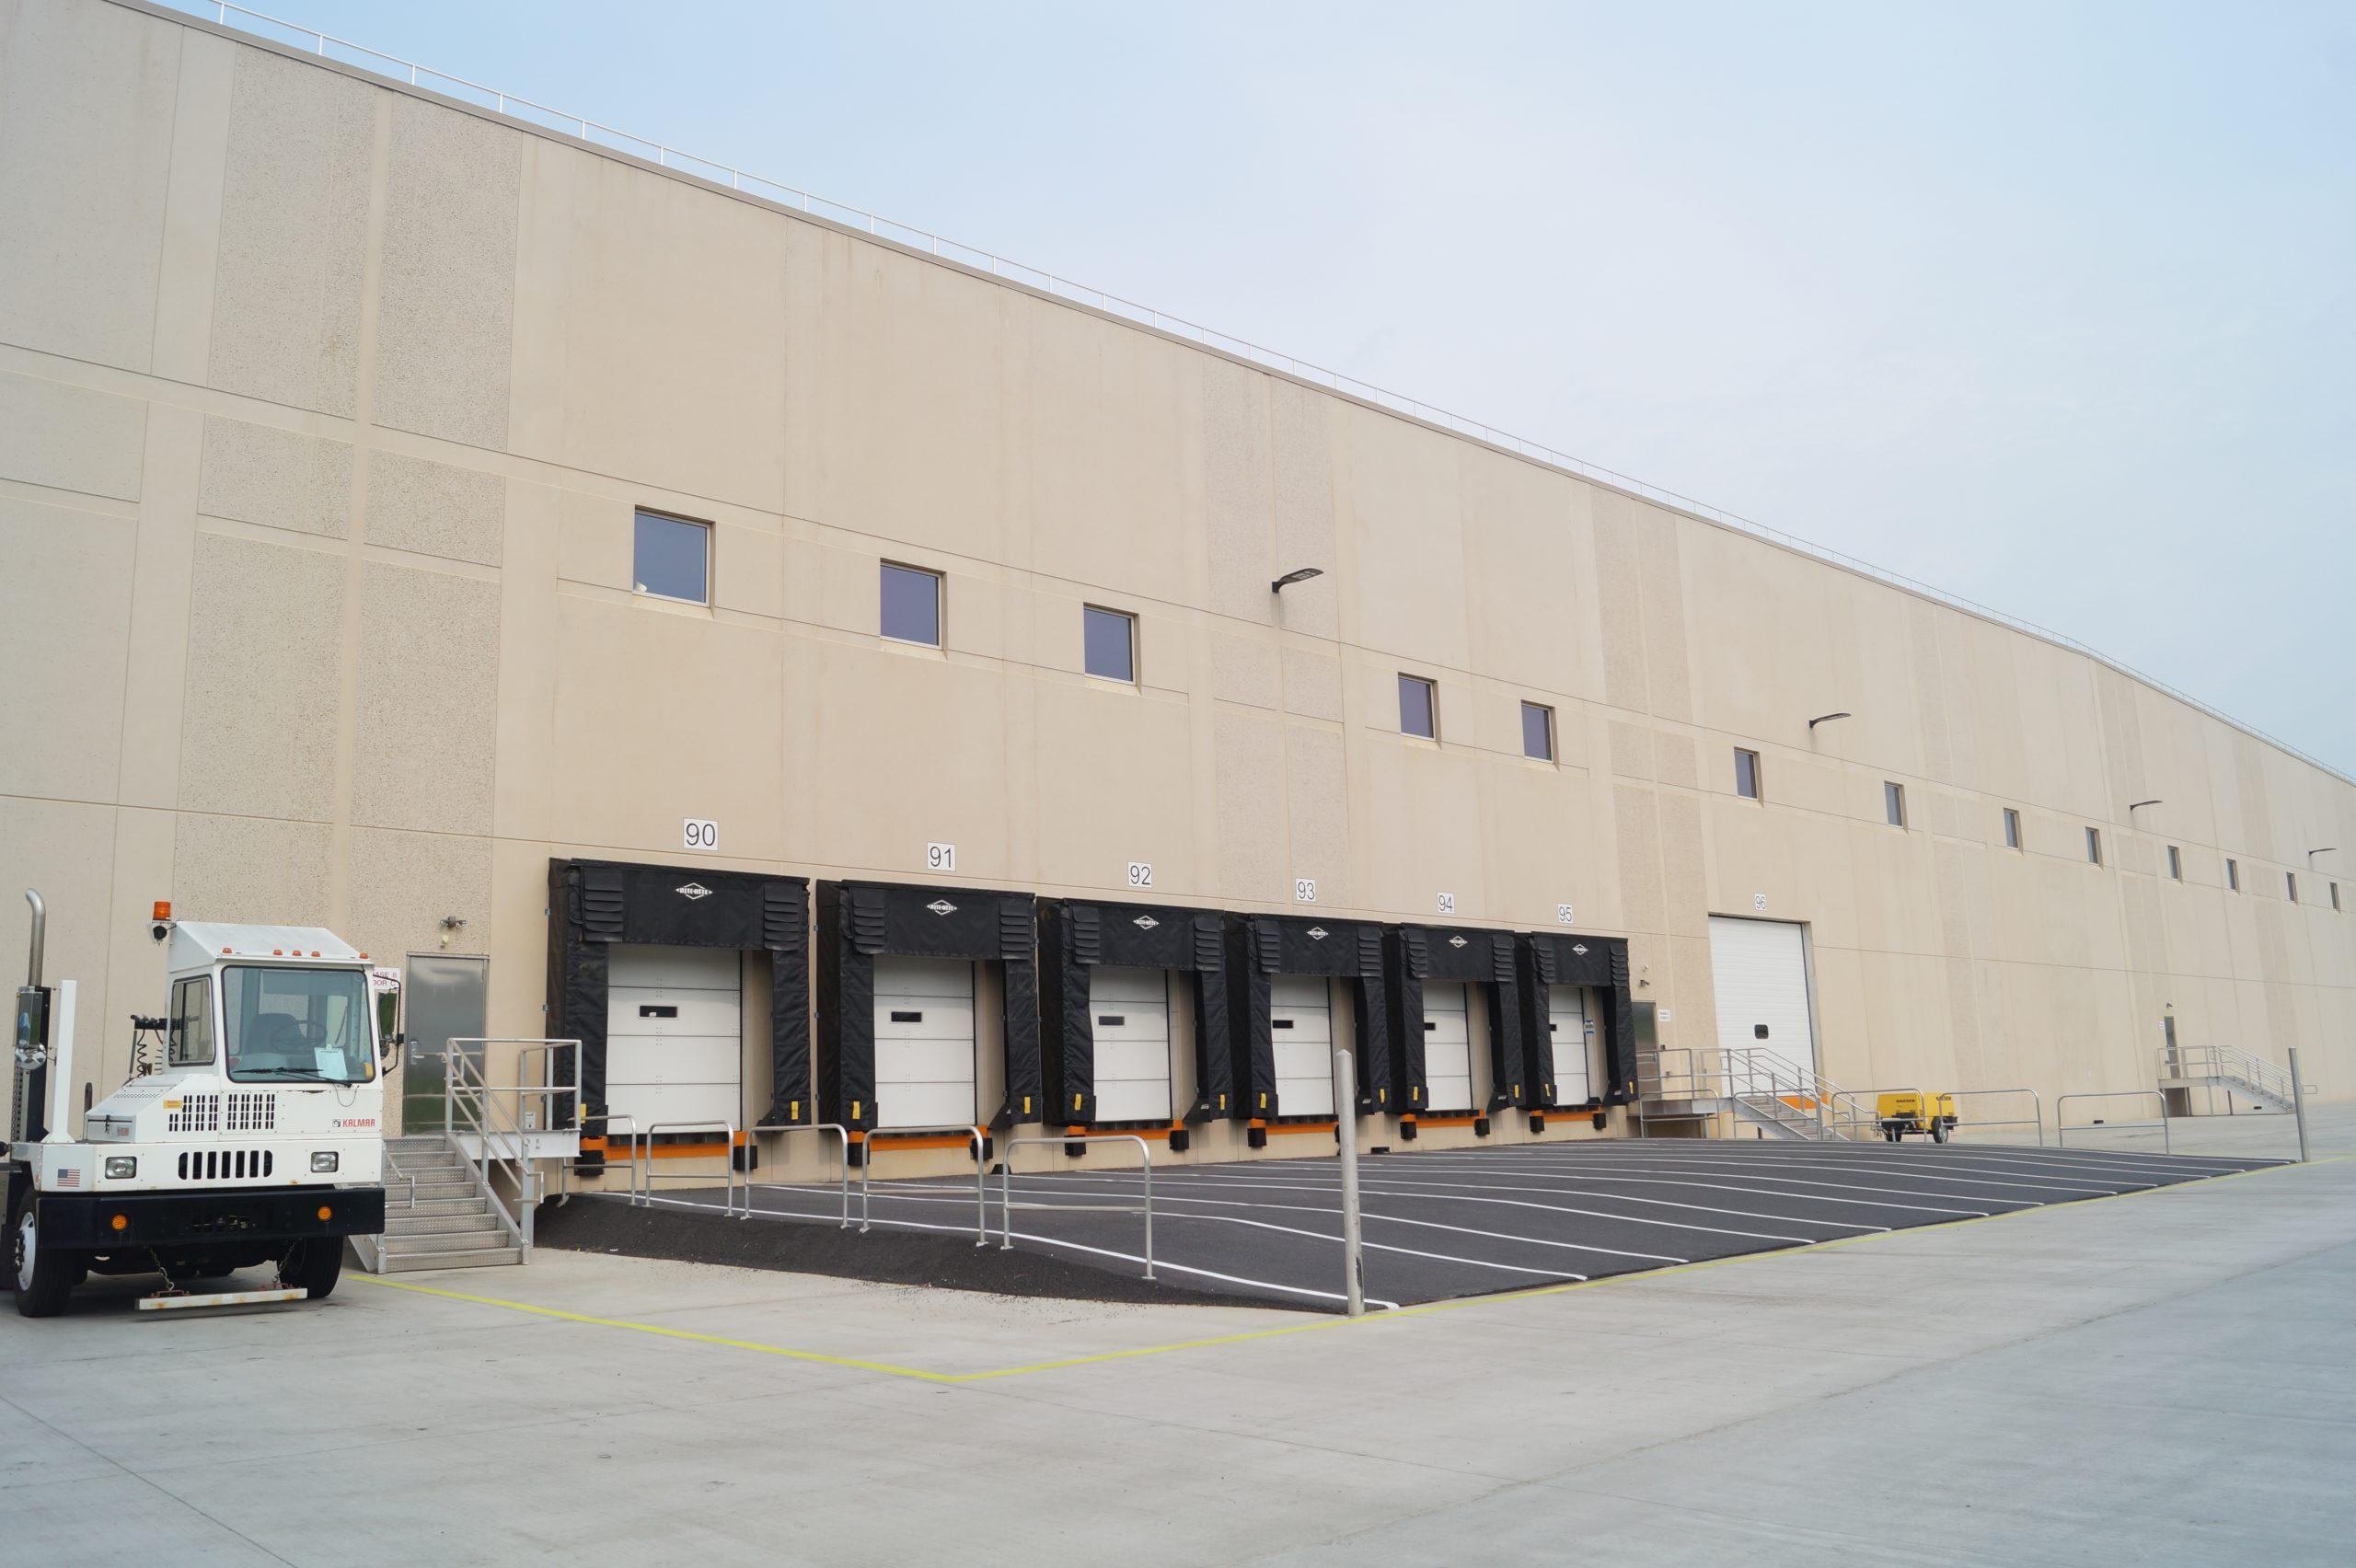 Exterior of Martin's warehouse